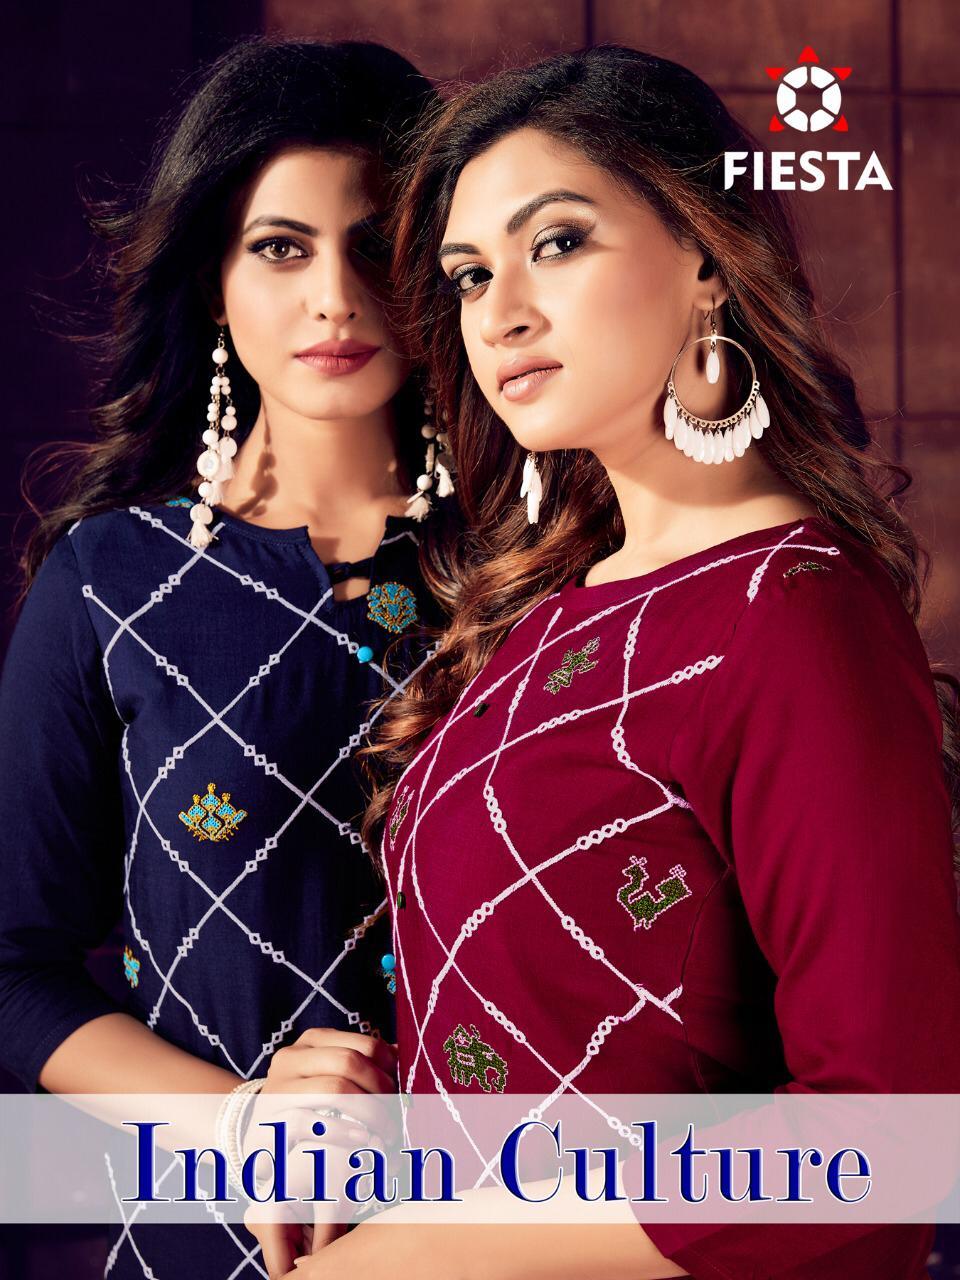 Fiesta Indian Culture Designer Work Embroided Kurties Wholesale